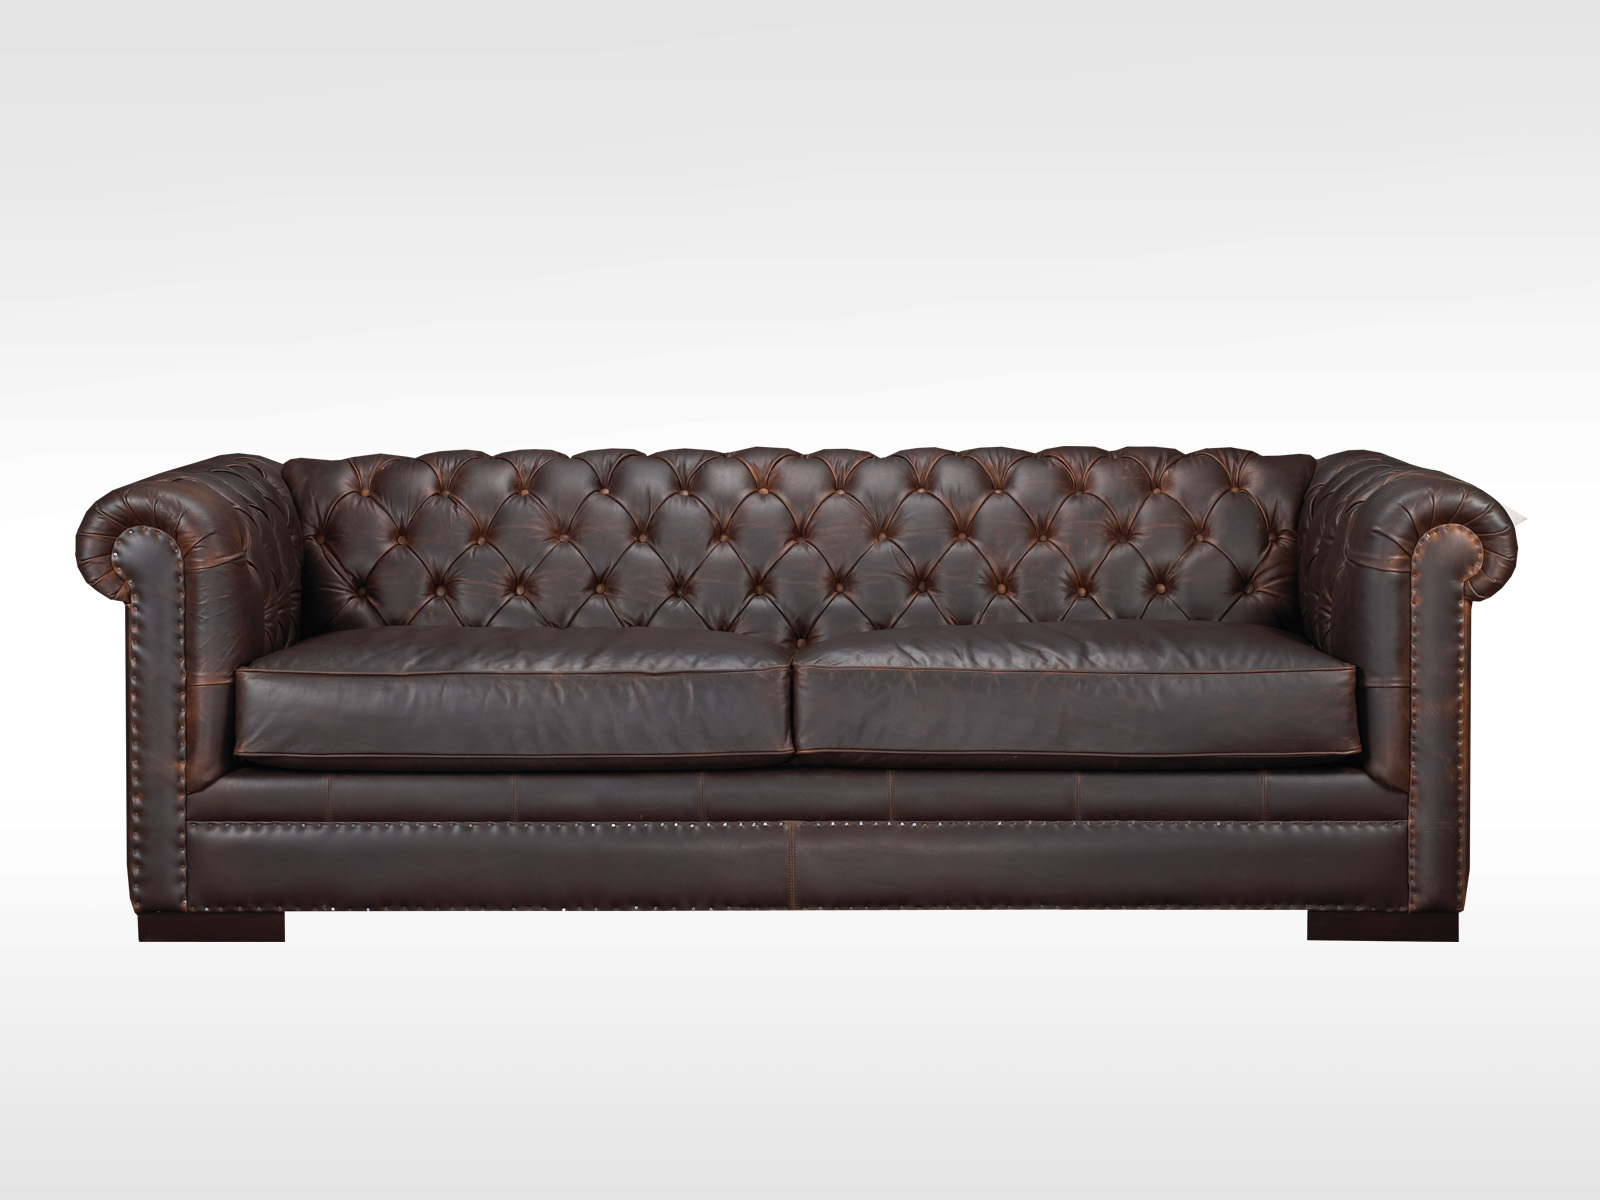 Kennedy Tufted Leather Sofa Hayward S The Best Furniture St John S Newfoundland